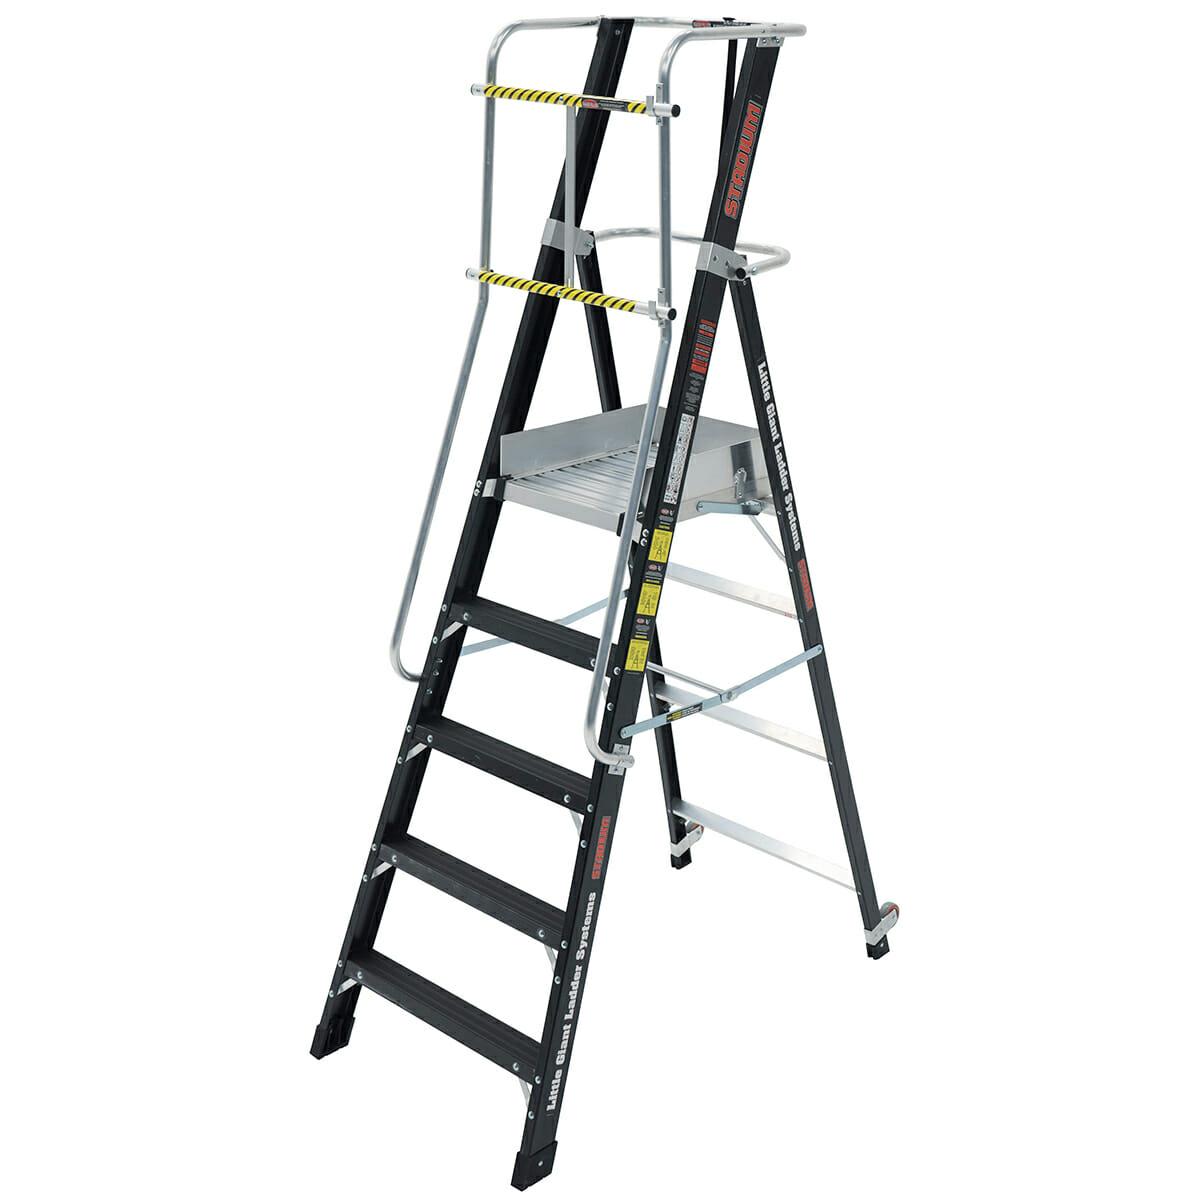 Stadium Ladder Ladder With Platform Little Giant Ladders